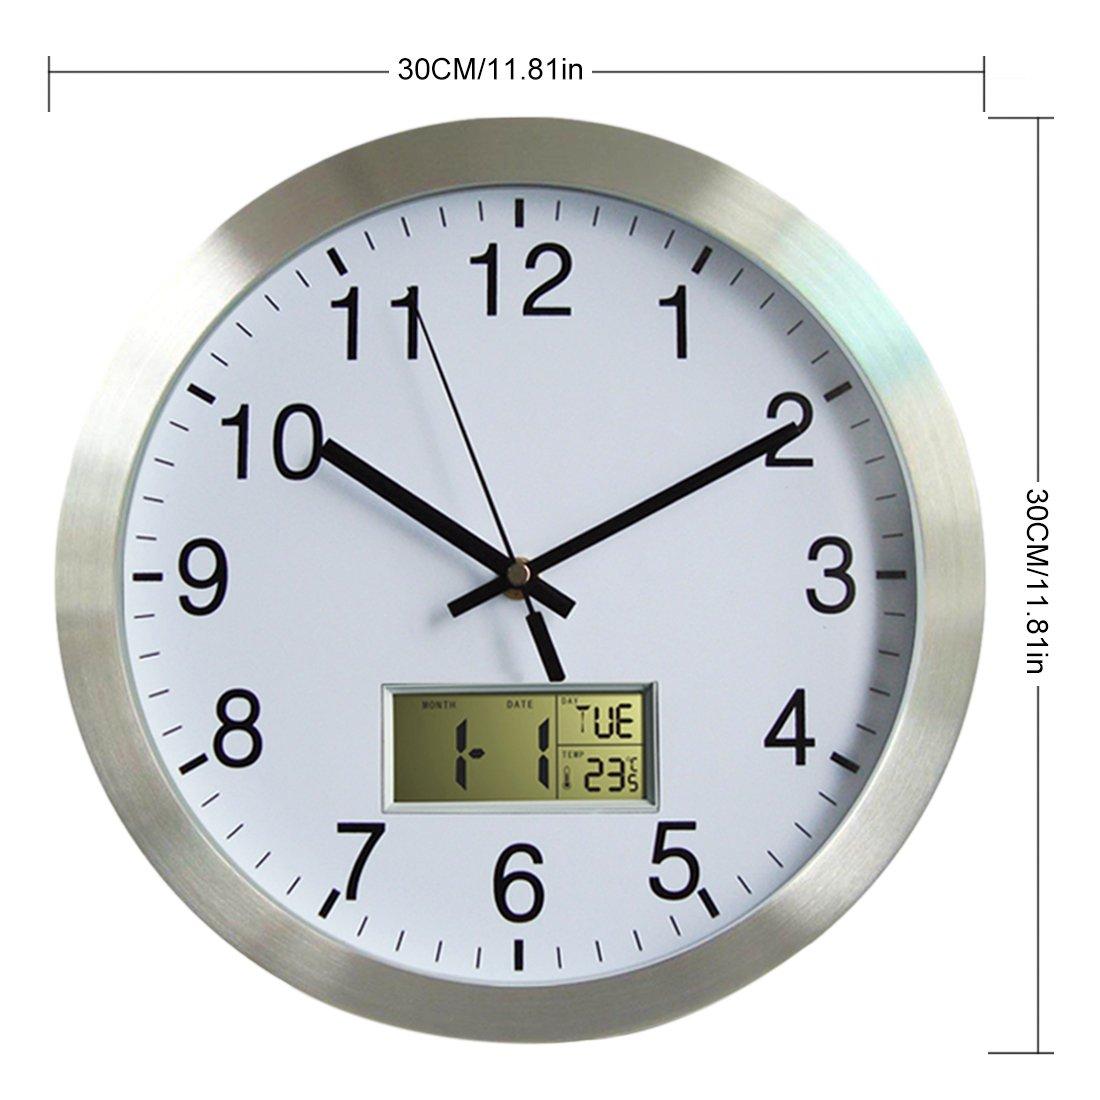 YAHAMA Radio Reloj de pared grande Radio Reloj Reloj de pared según los Radio Reloj con calendario de pared radiocontrolado con termómetro de diámetro 30 ...